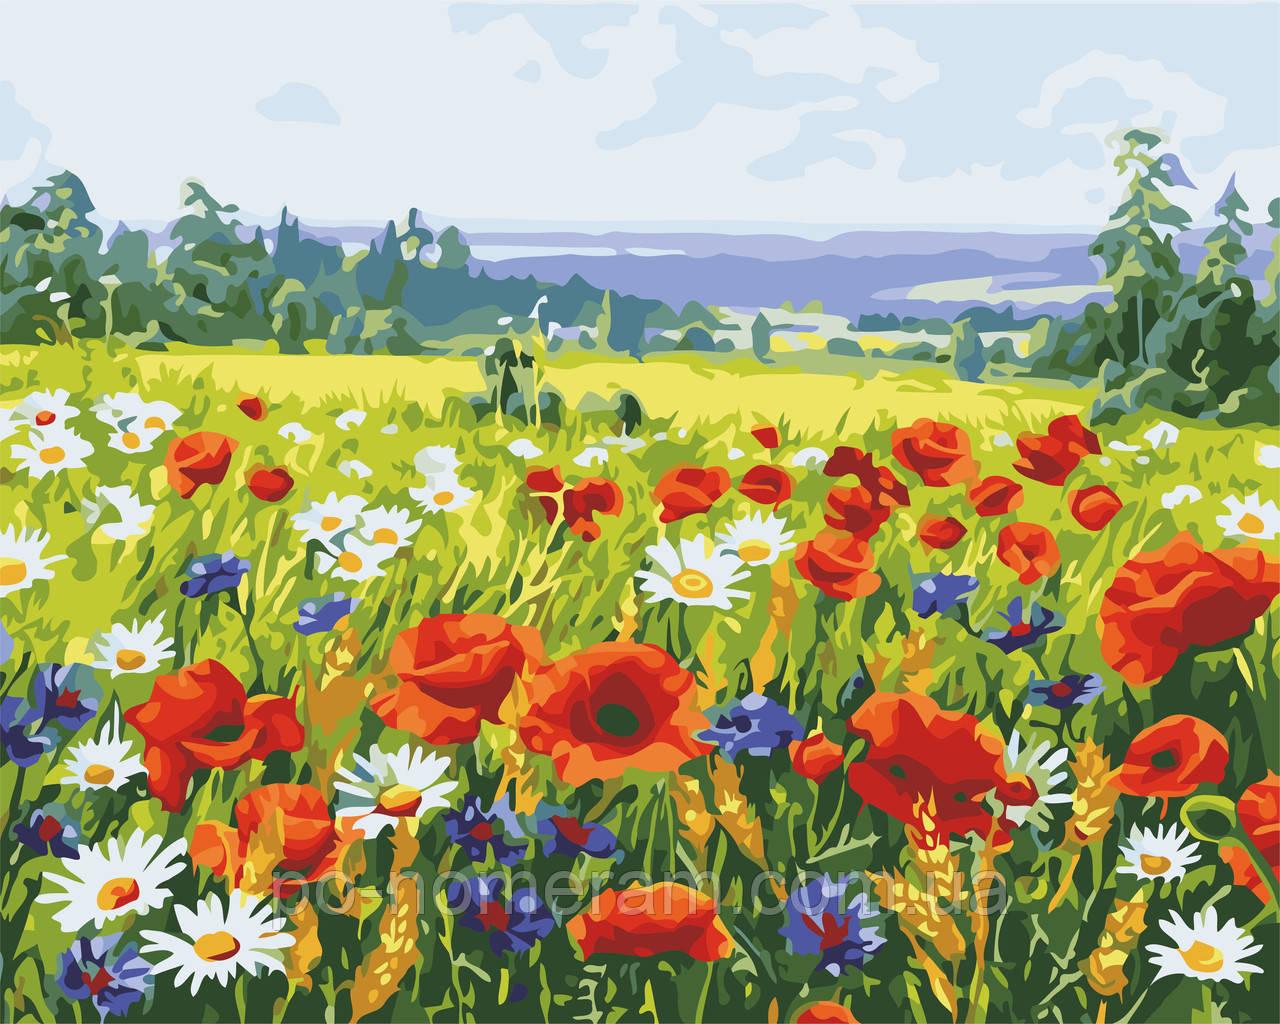 картина по номерам поле цветов As0546 40 х 50 см Artstory